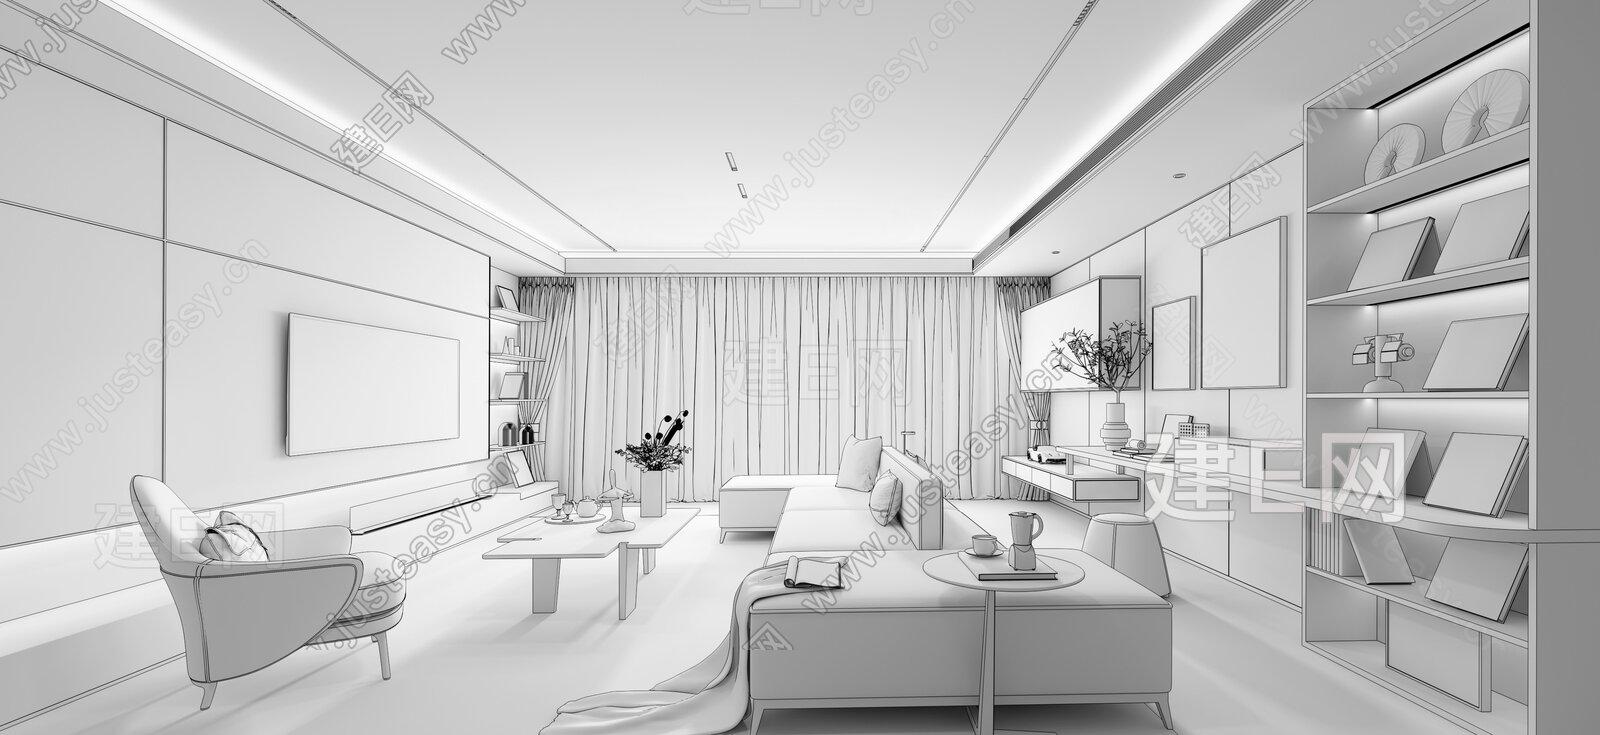 S.U.N 孙文设计事务所 现代轻奢客厅3d模型